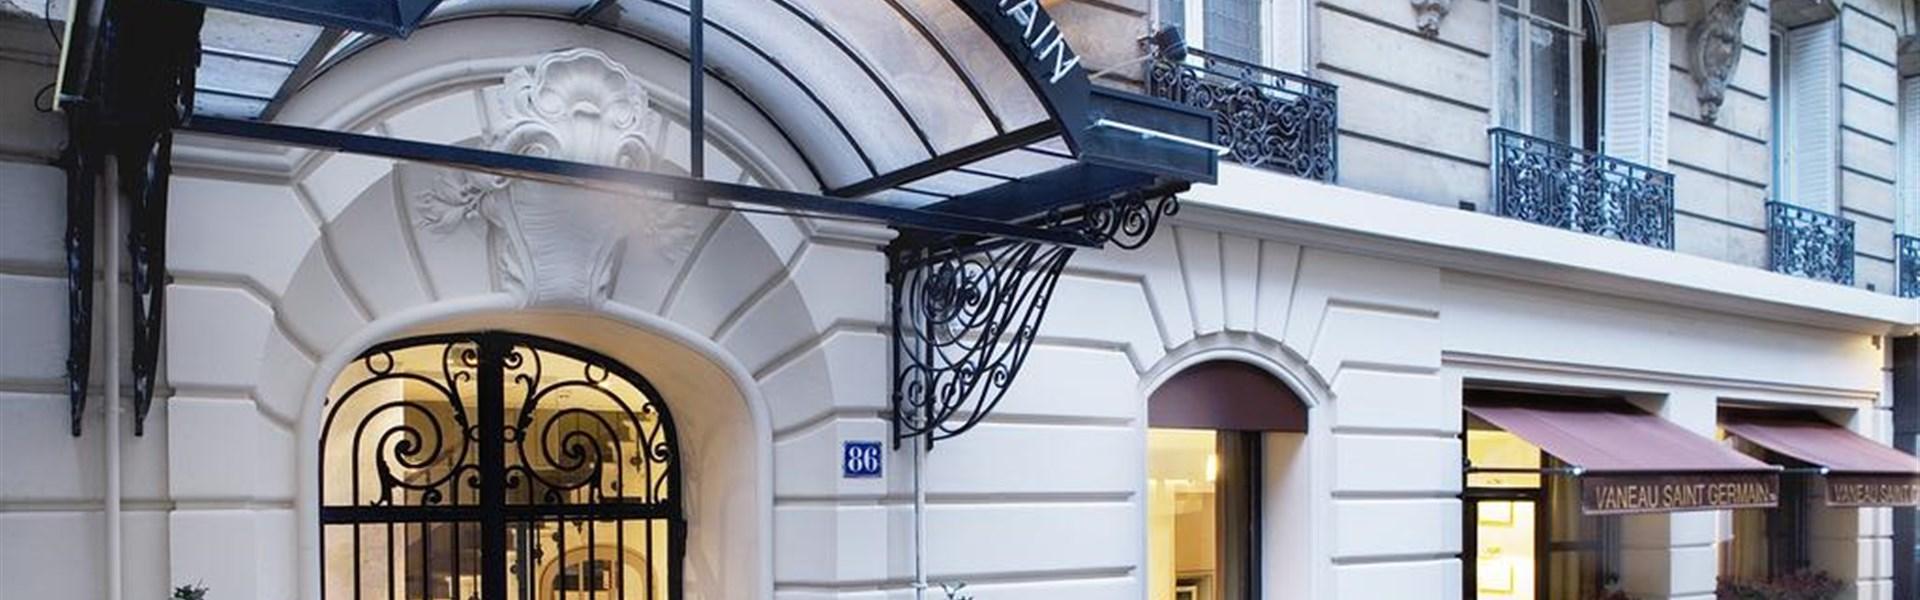 Marco Polo - Paříž Hotel Vaneau St Germain -